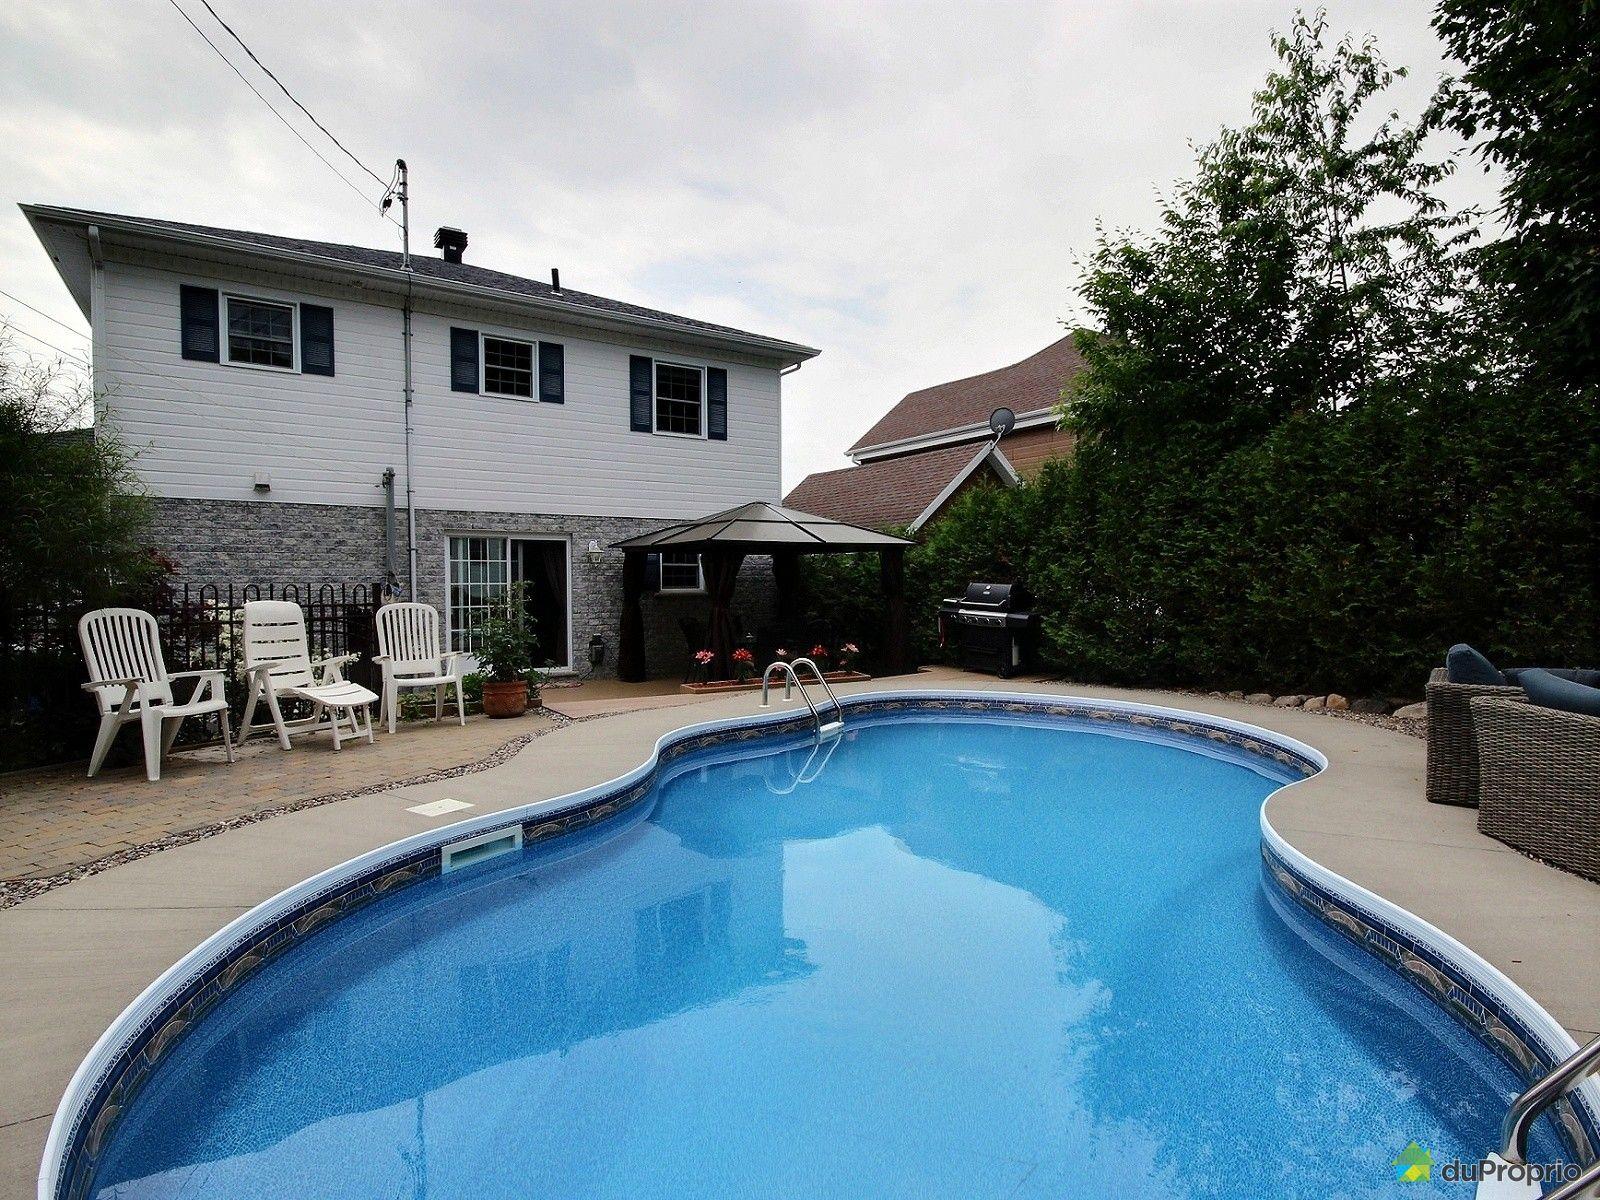 Maison vendre charlesbourg 1067 rue de la ch telaine for Arpidrome charlesbourg piscine